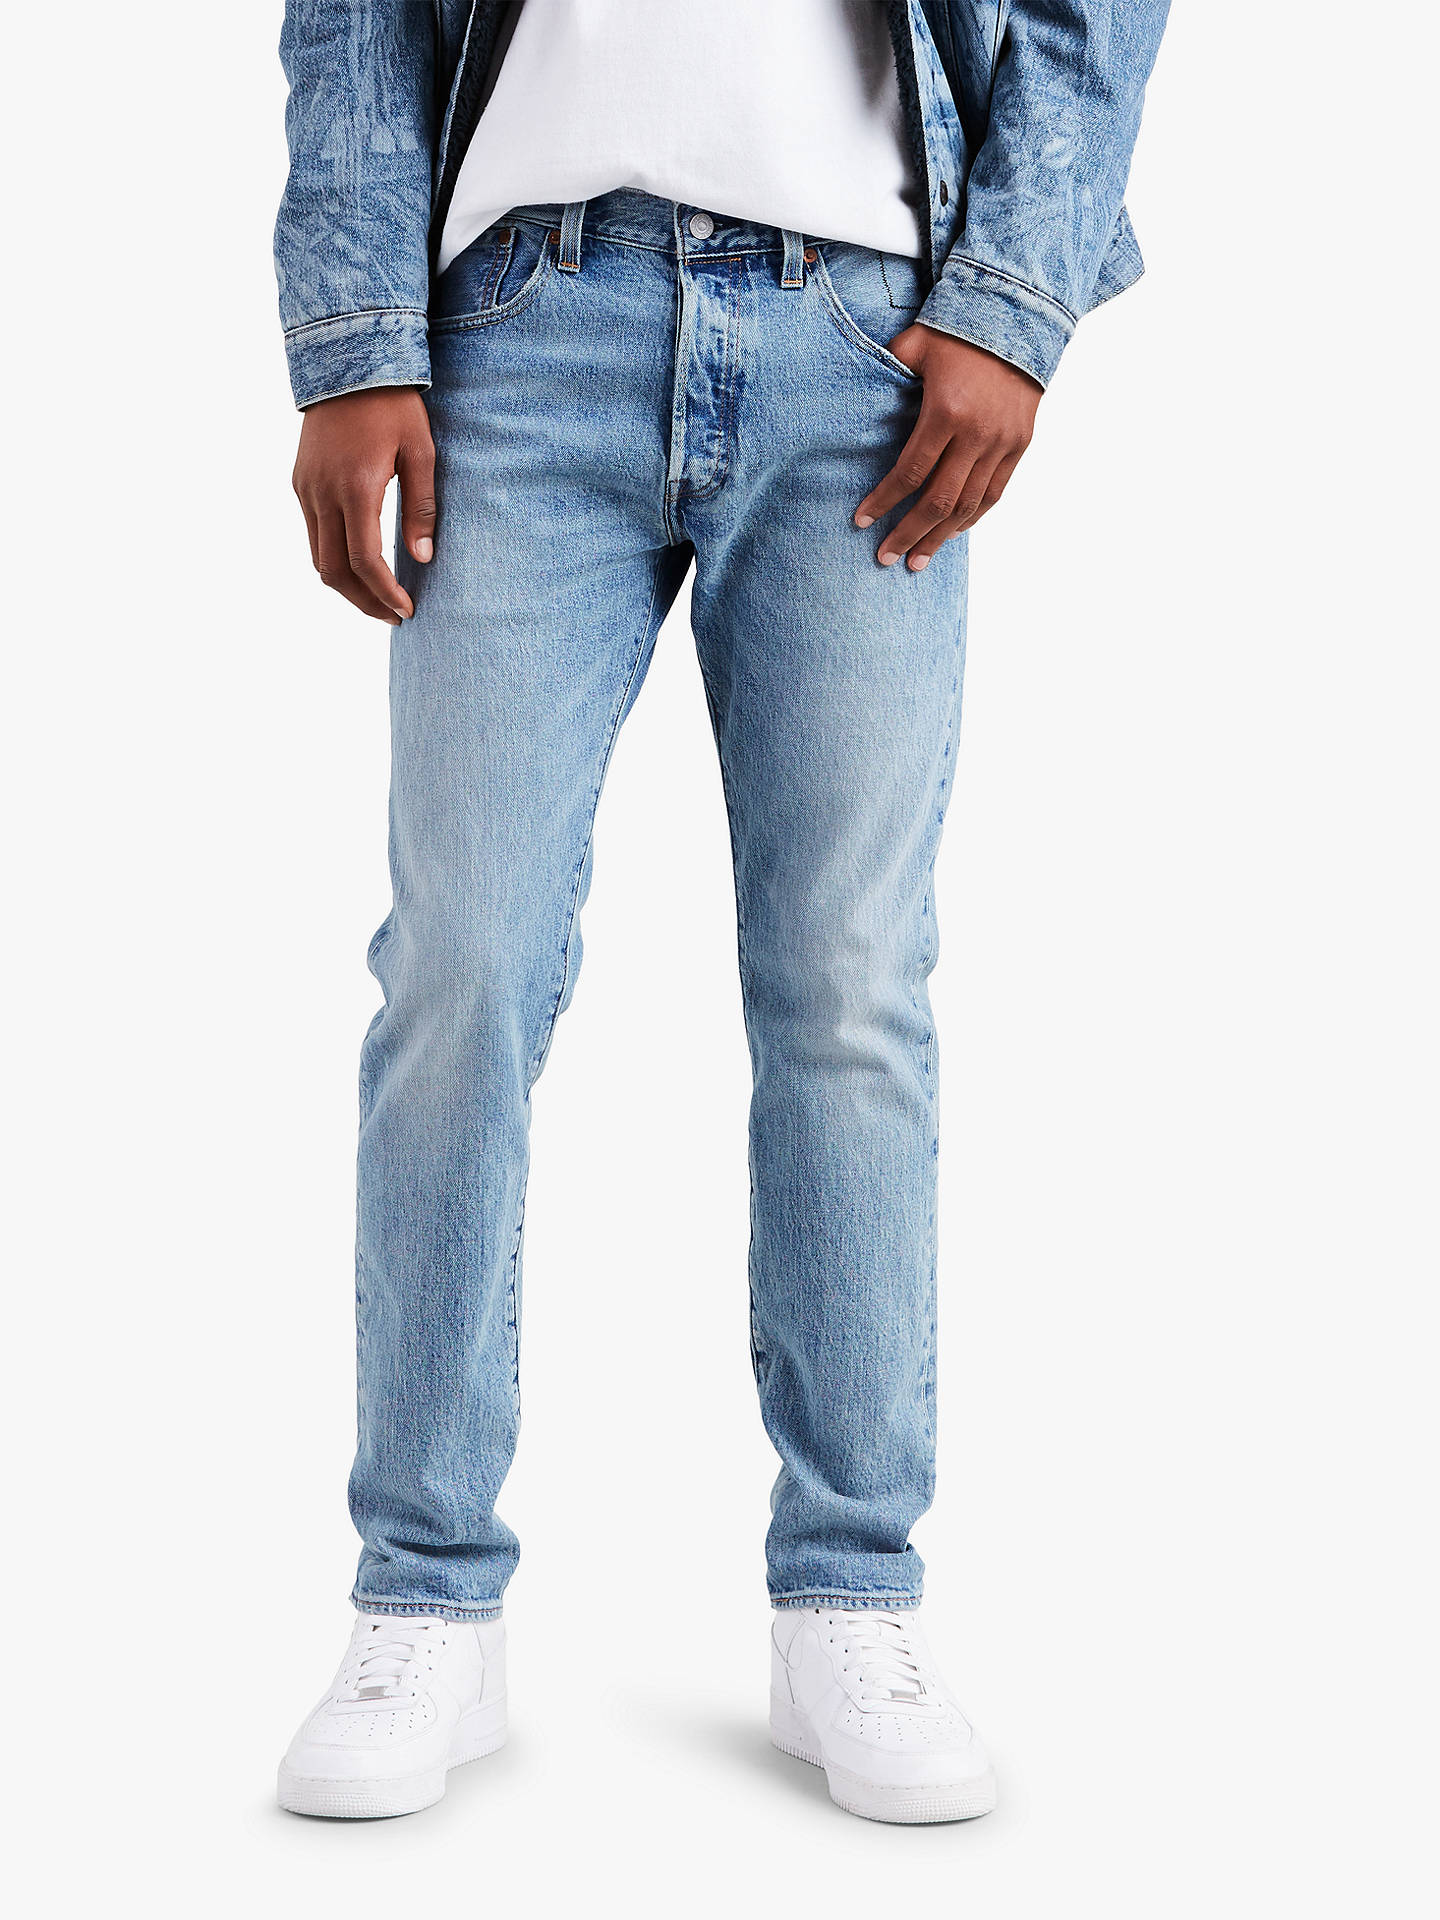 73e2af63 Buy Levi's x Justin Timberlake 501 Slim Tapered Fit Jeans, Hillman, 32R  Online at ...